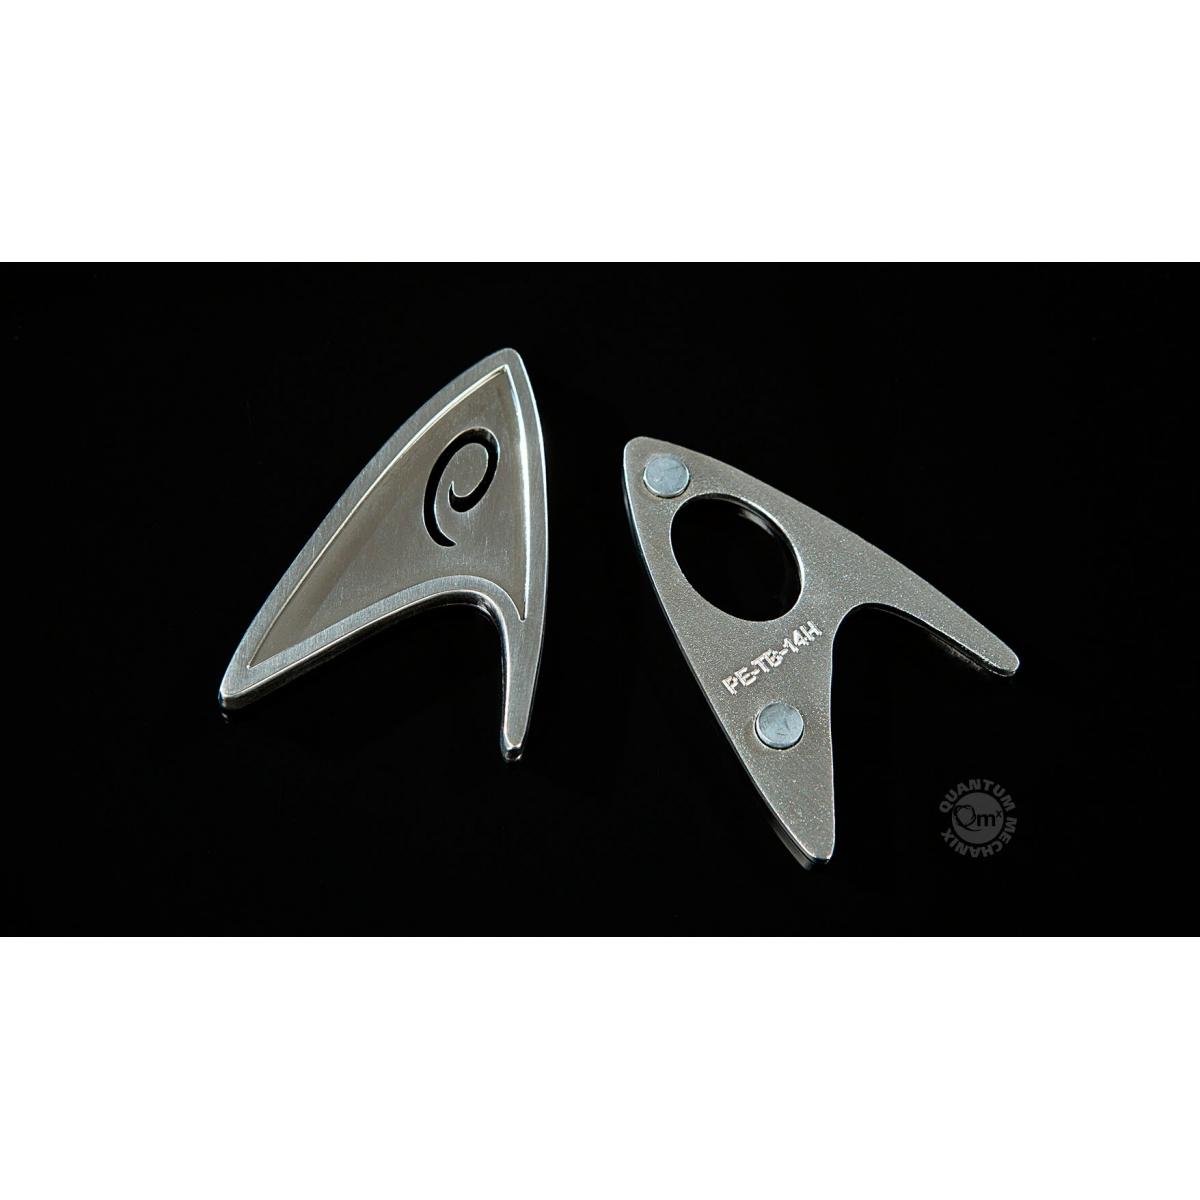 star trek 2009 r plique 1 1 starfleet badge engineering division magn tique figurine discount. Black Bedroom Furniture Sets. Home Design Ideas